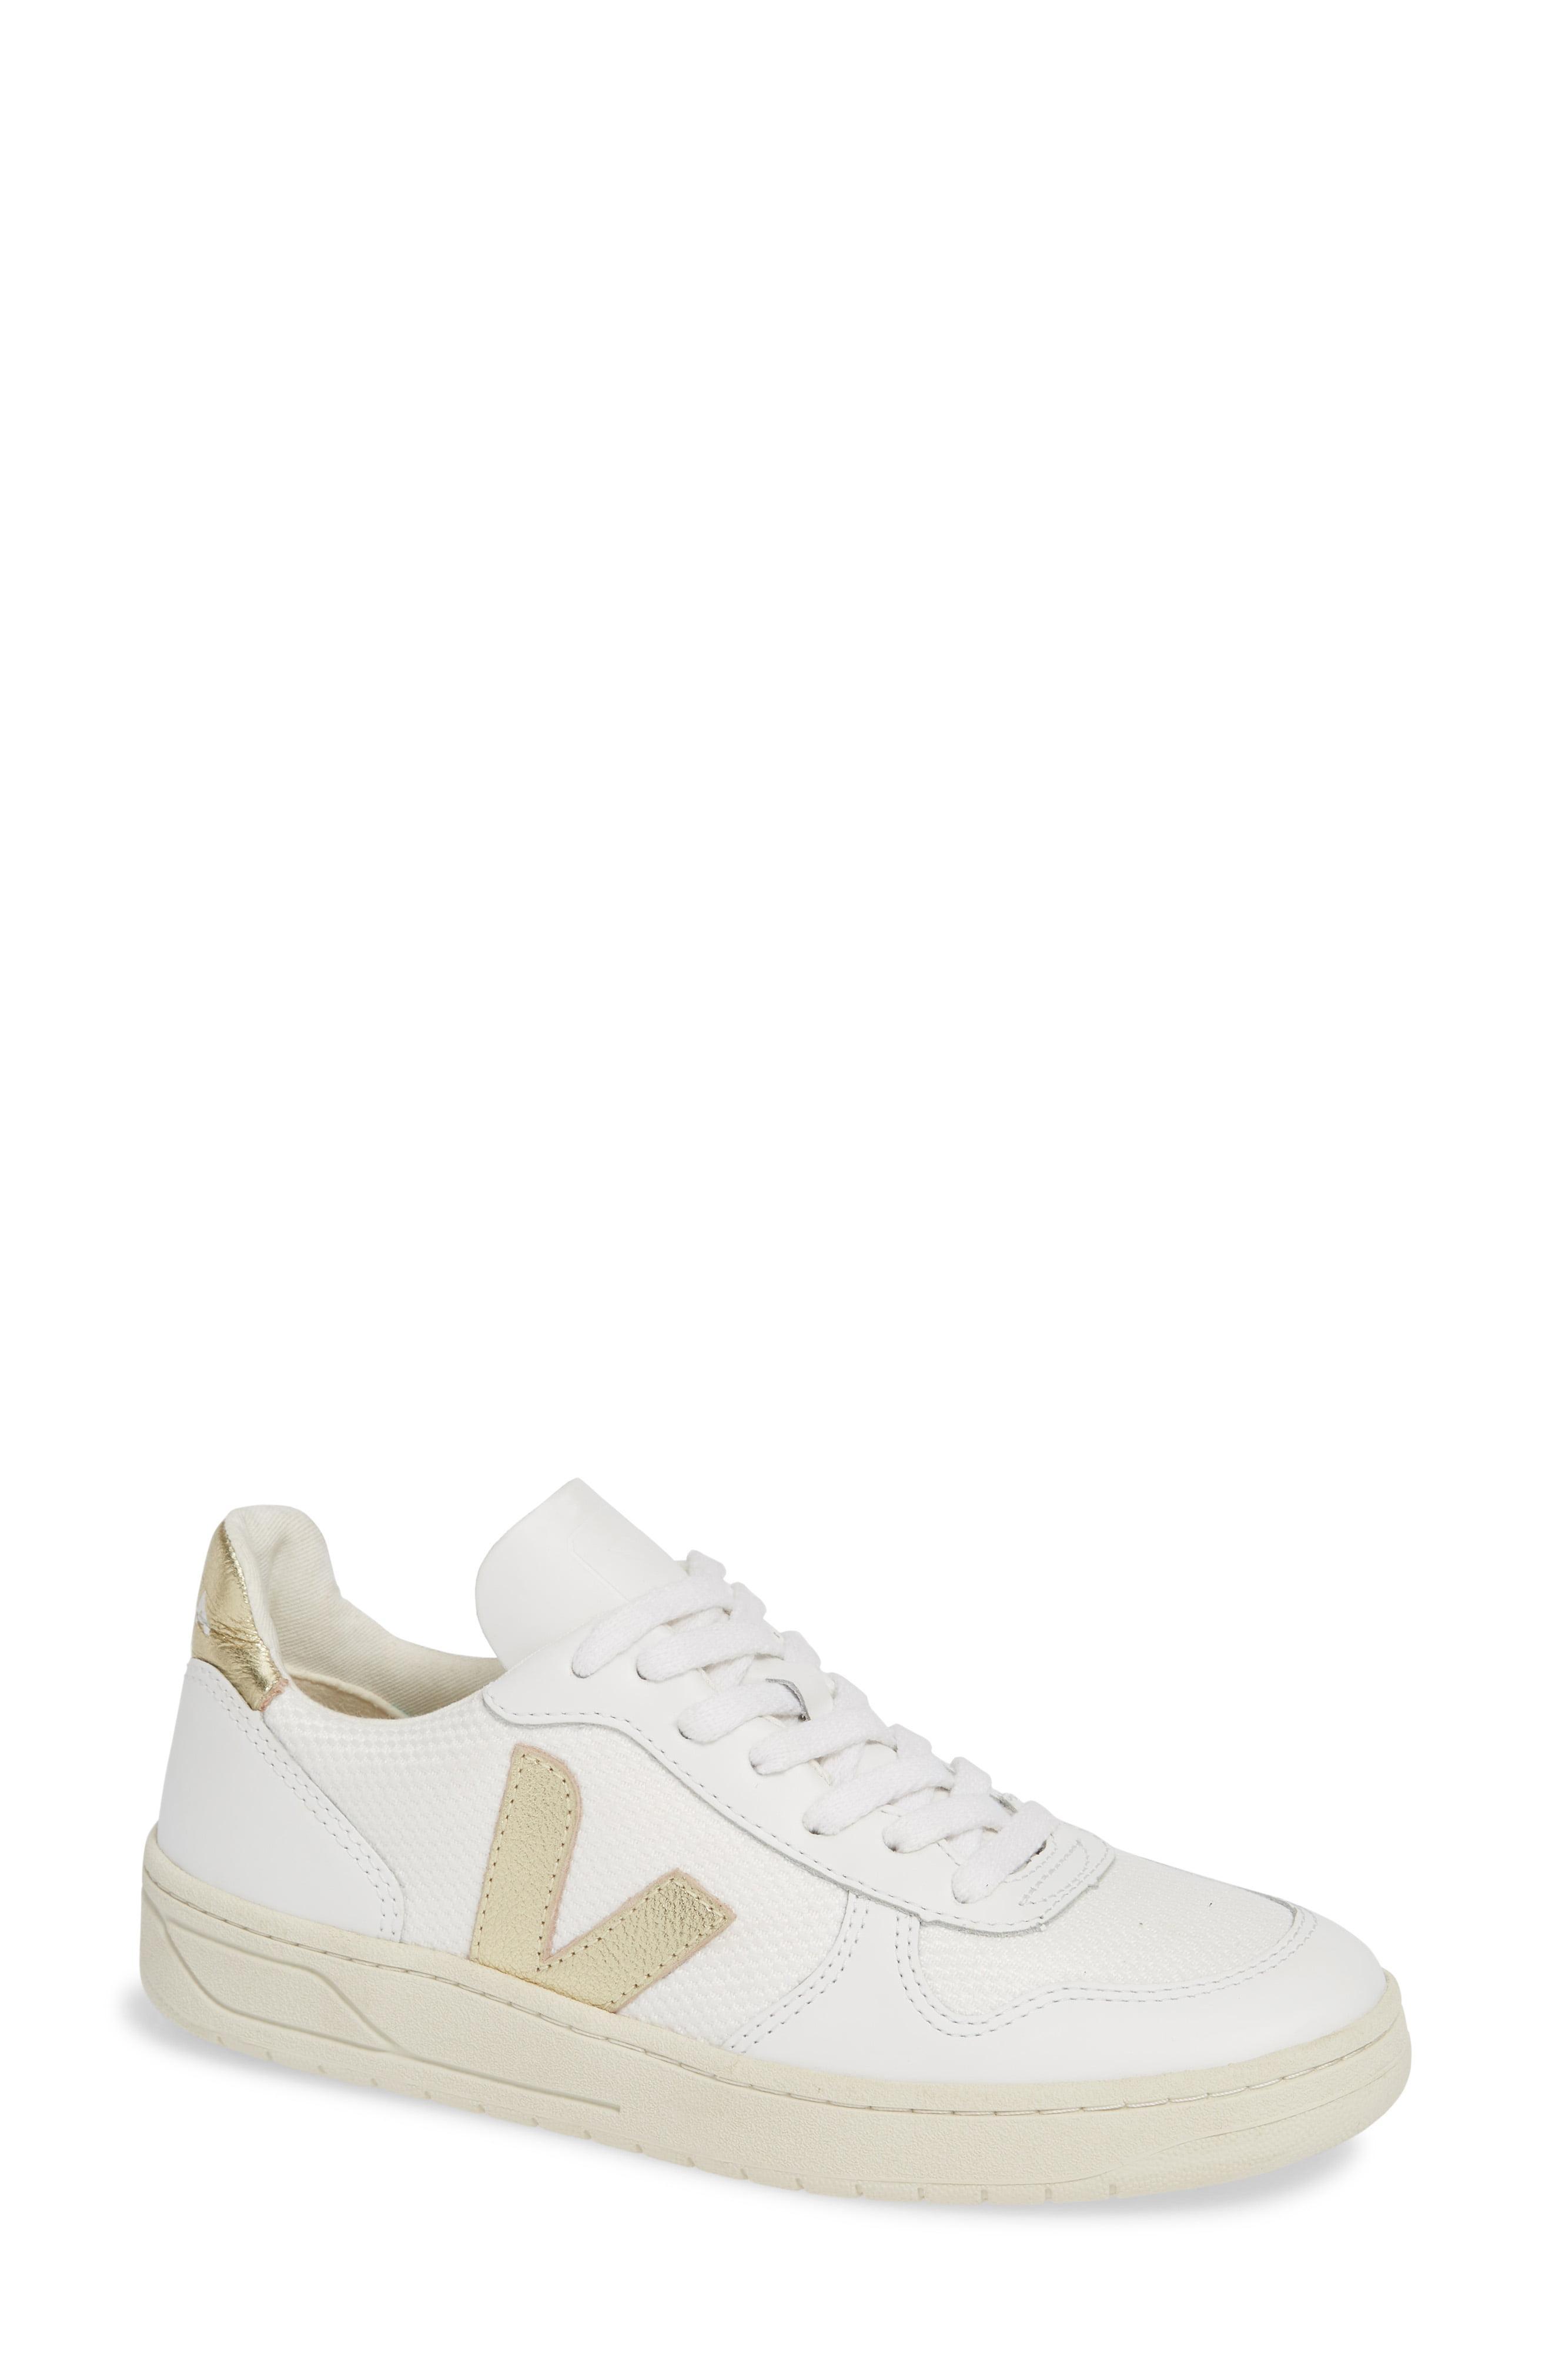 brand new d8da7 f32c7 Lyst - Veja V-10 Sneaker in White